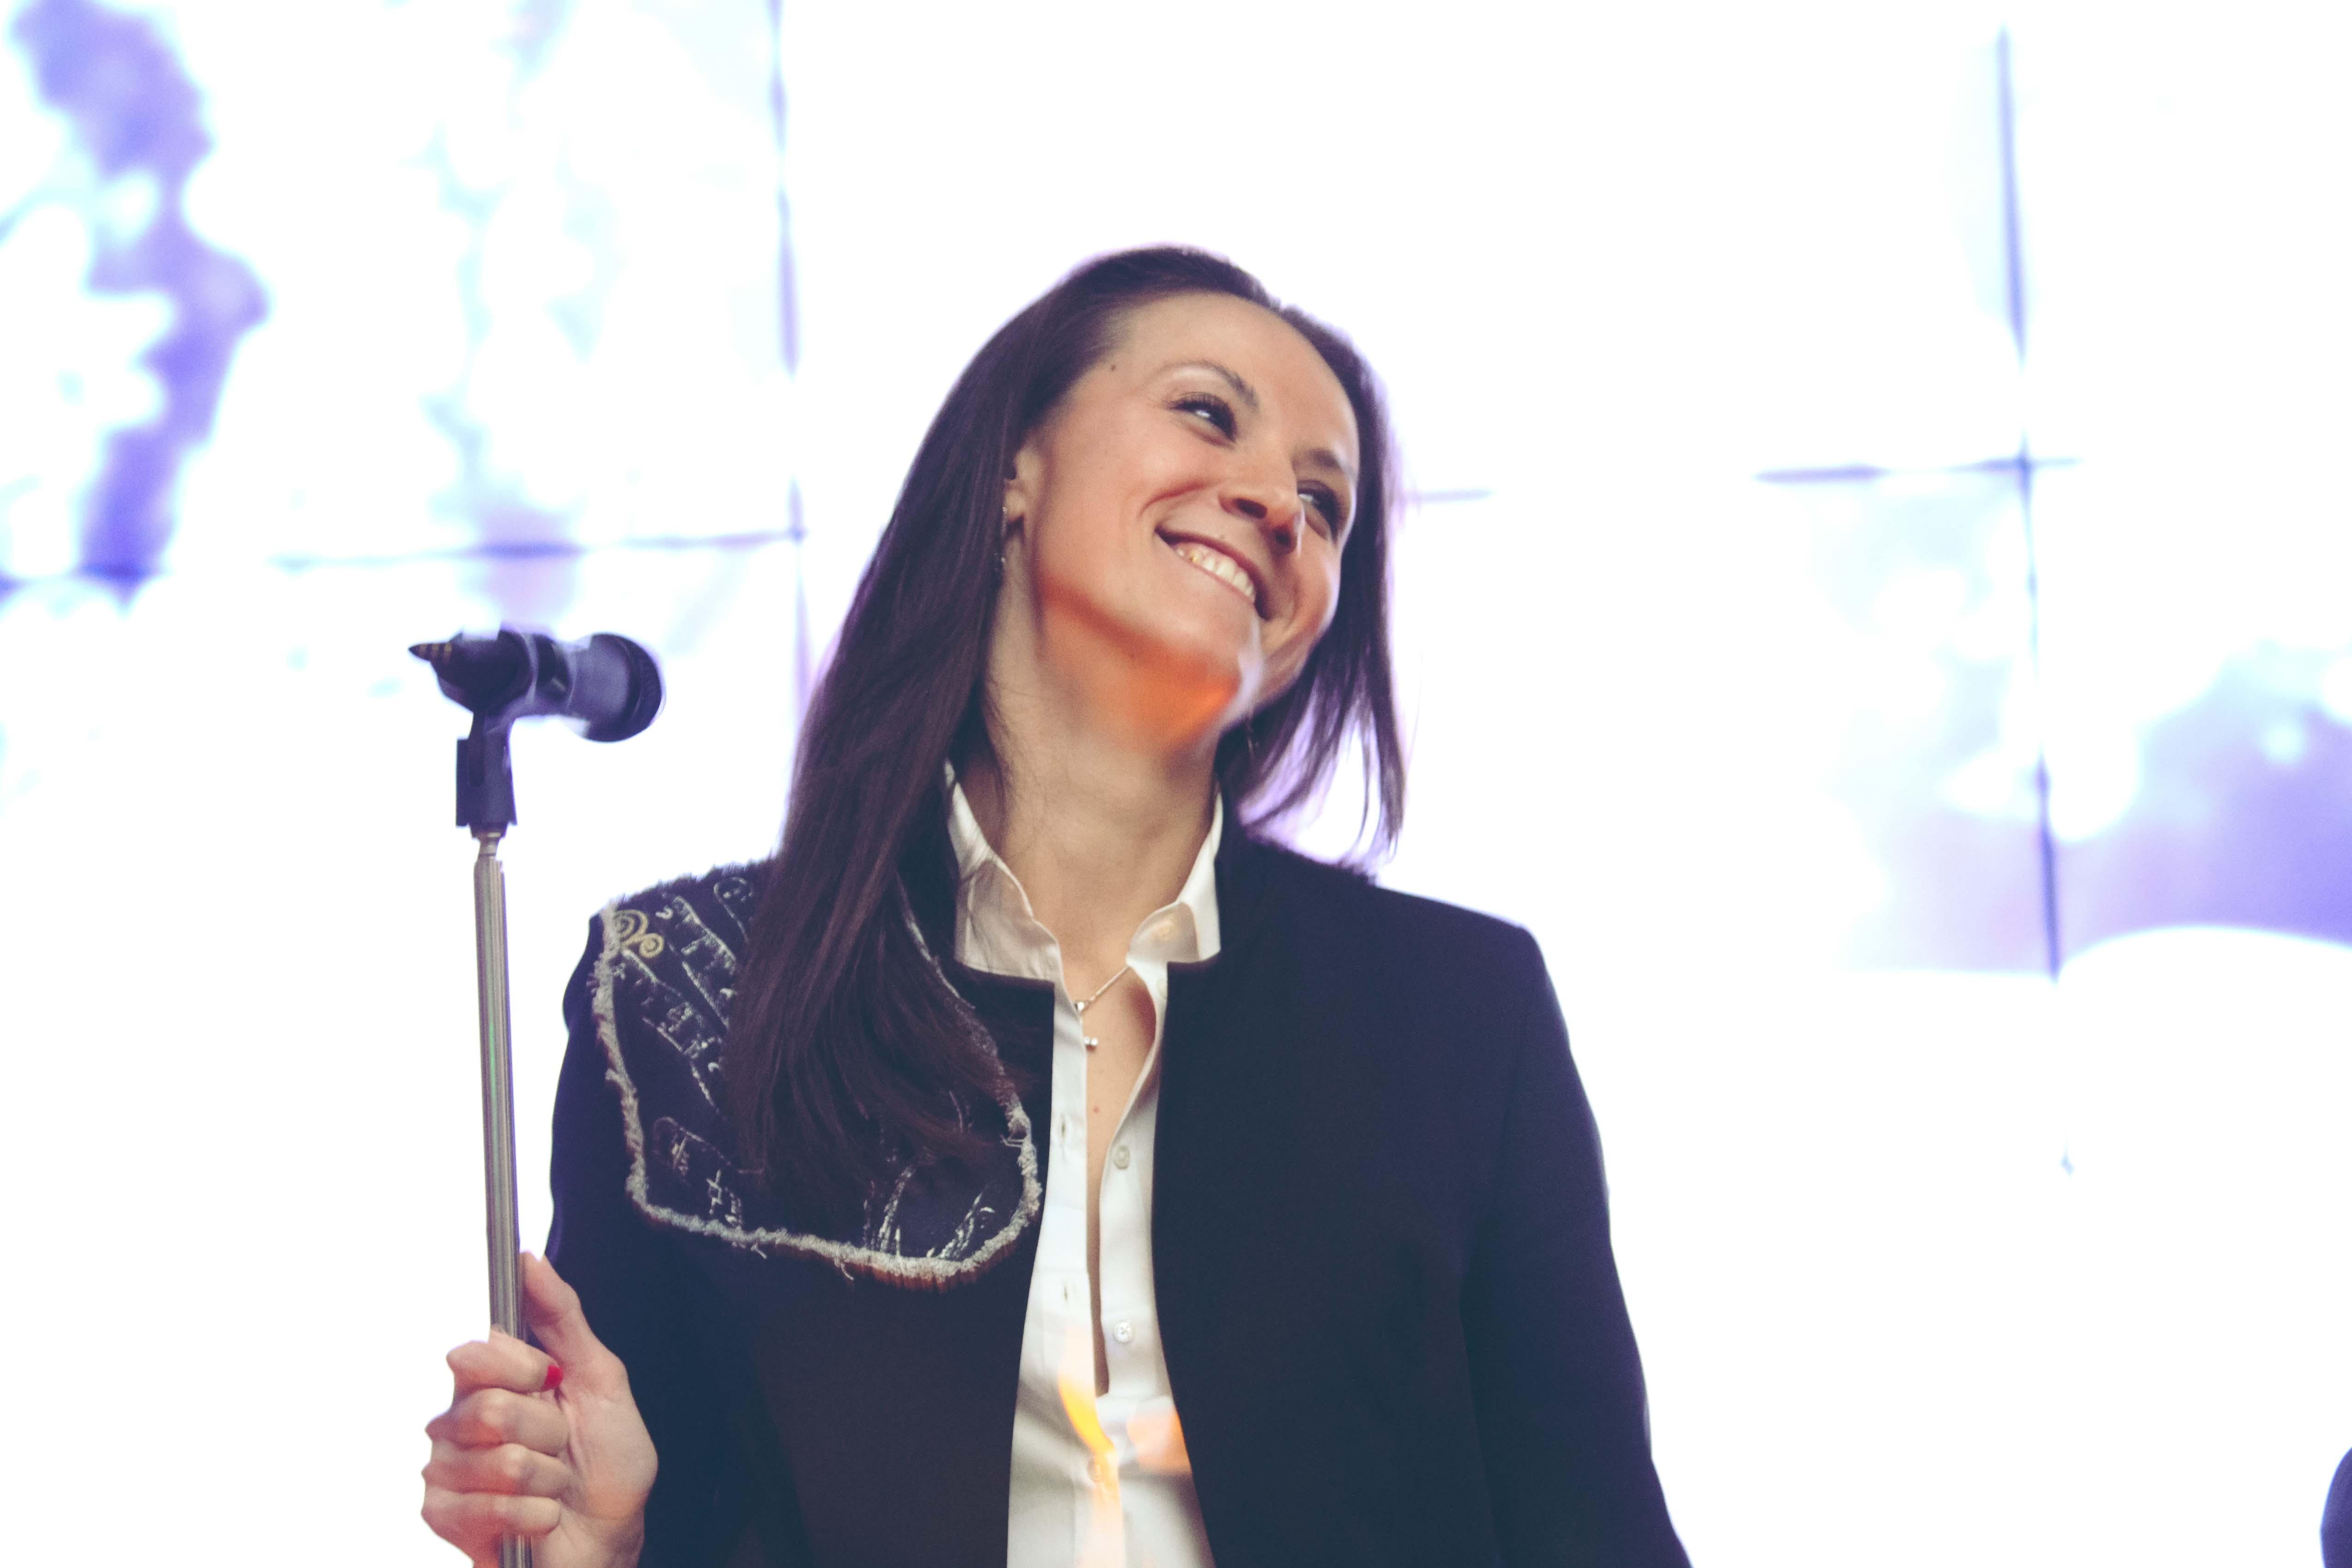 vasilevskaya9 Олена Василевська — UA MUSIC | Енциклопедія української музики